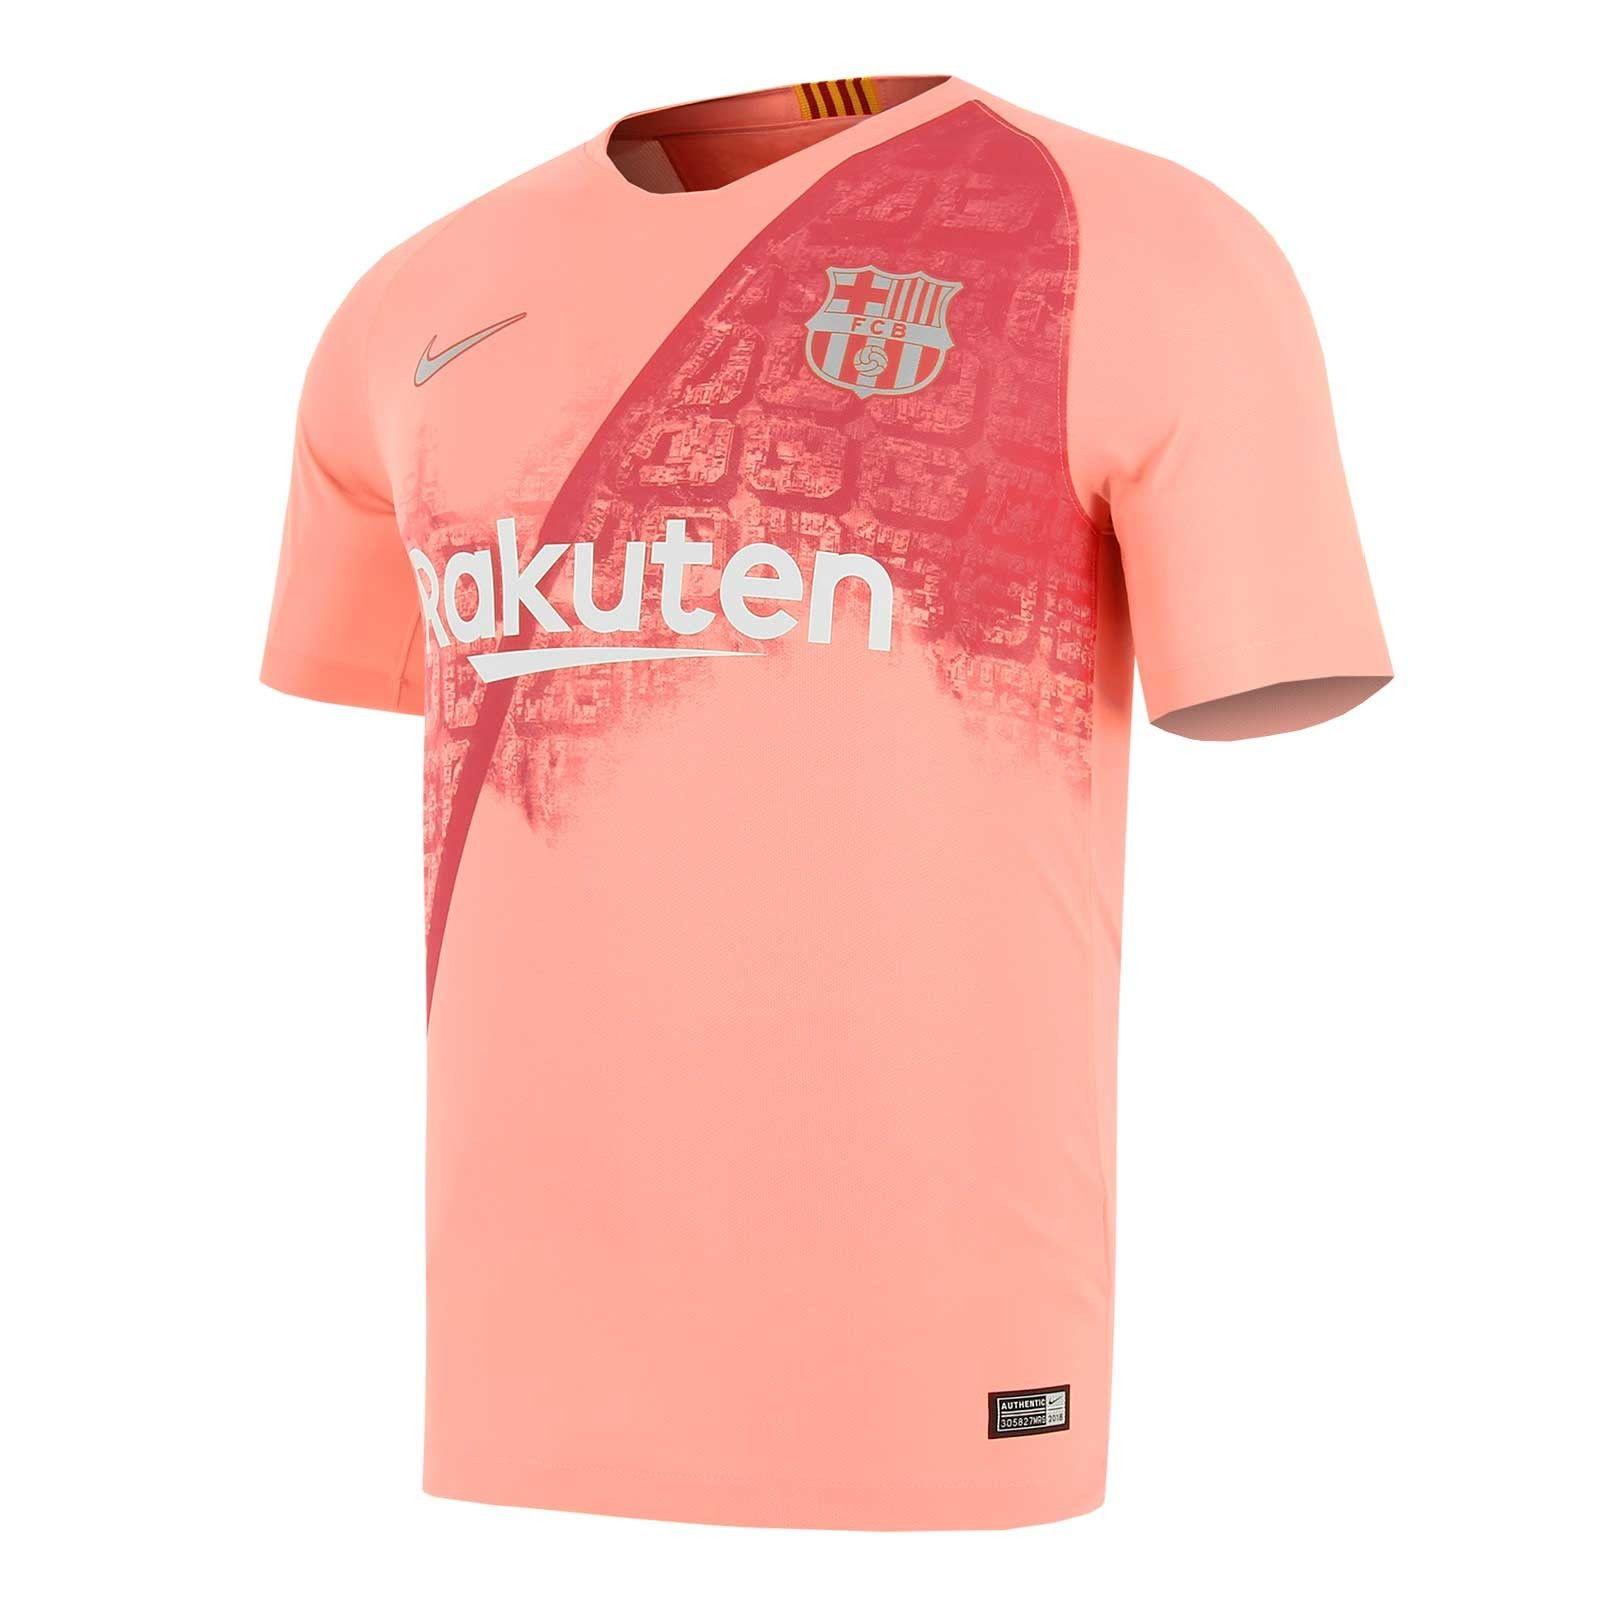 Camiseta Nike Barcelona 3a 2018 2019 Stadium  2ac13d68ea2